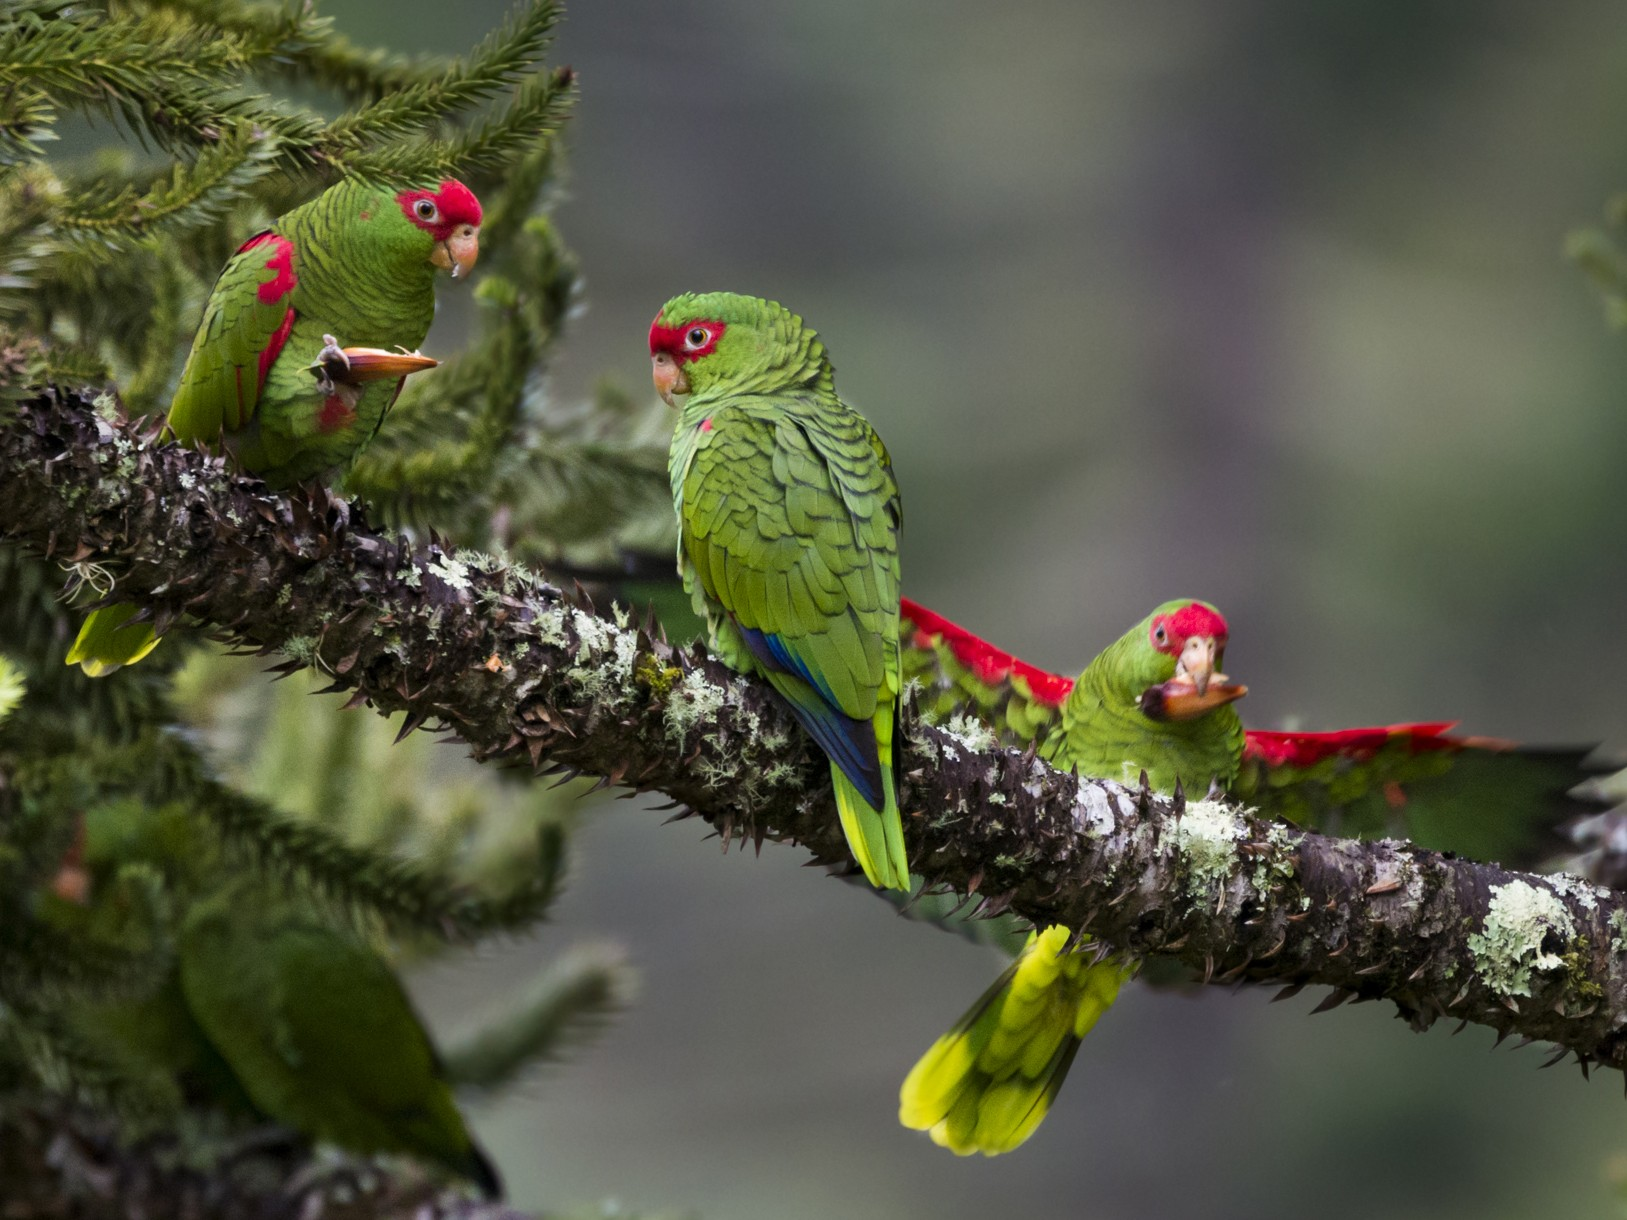 Red-spectacled Parrot - Claudia Brasileiro